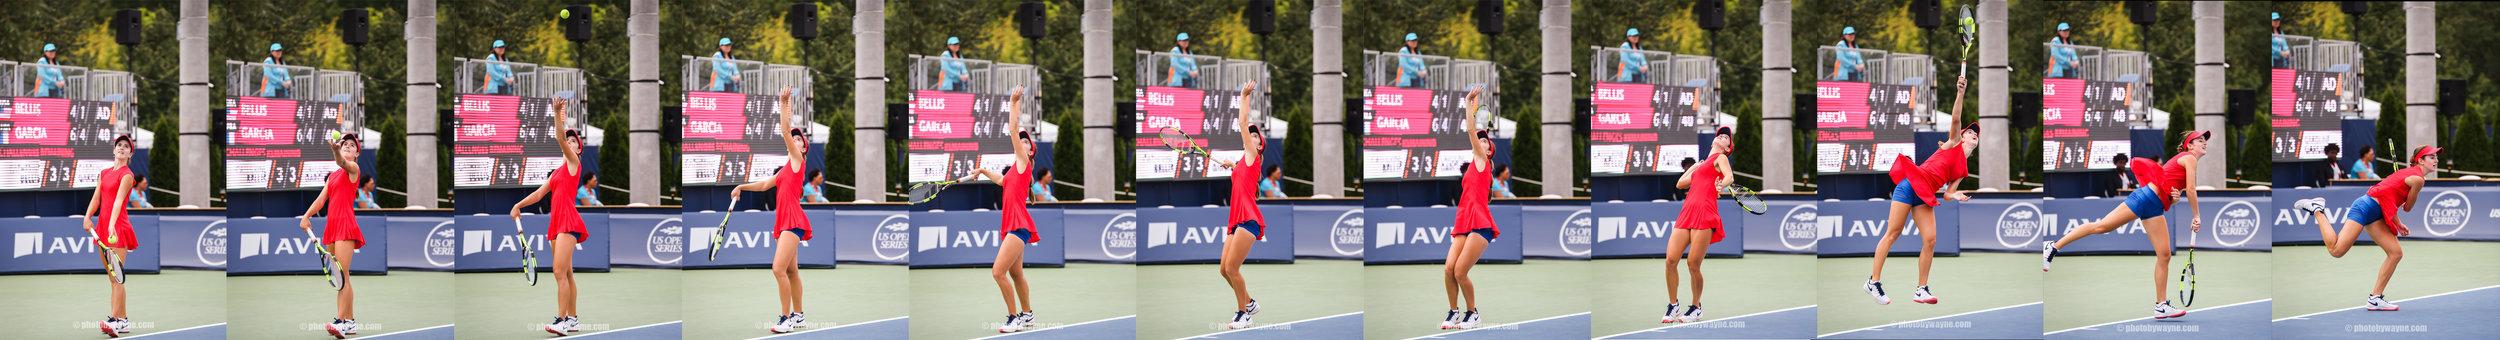 tennis-serve-sequence-cici-bellis-rogers-cup-2017.jpg